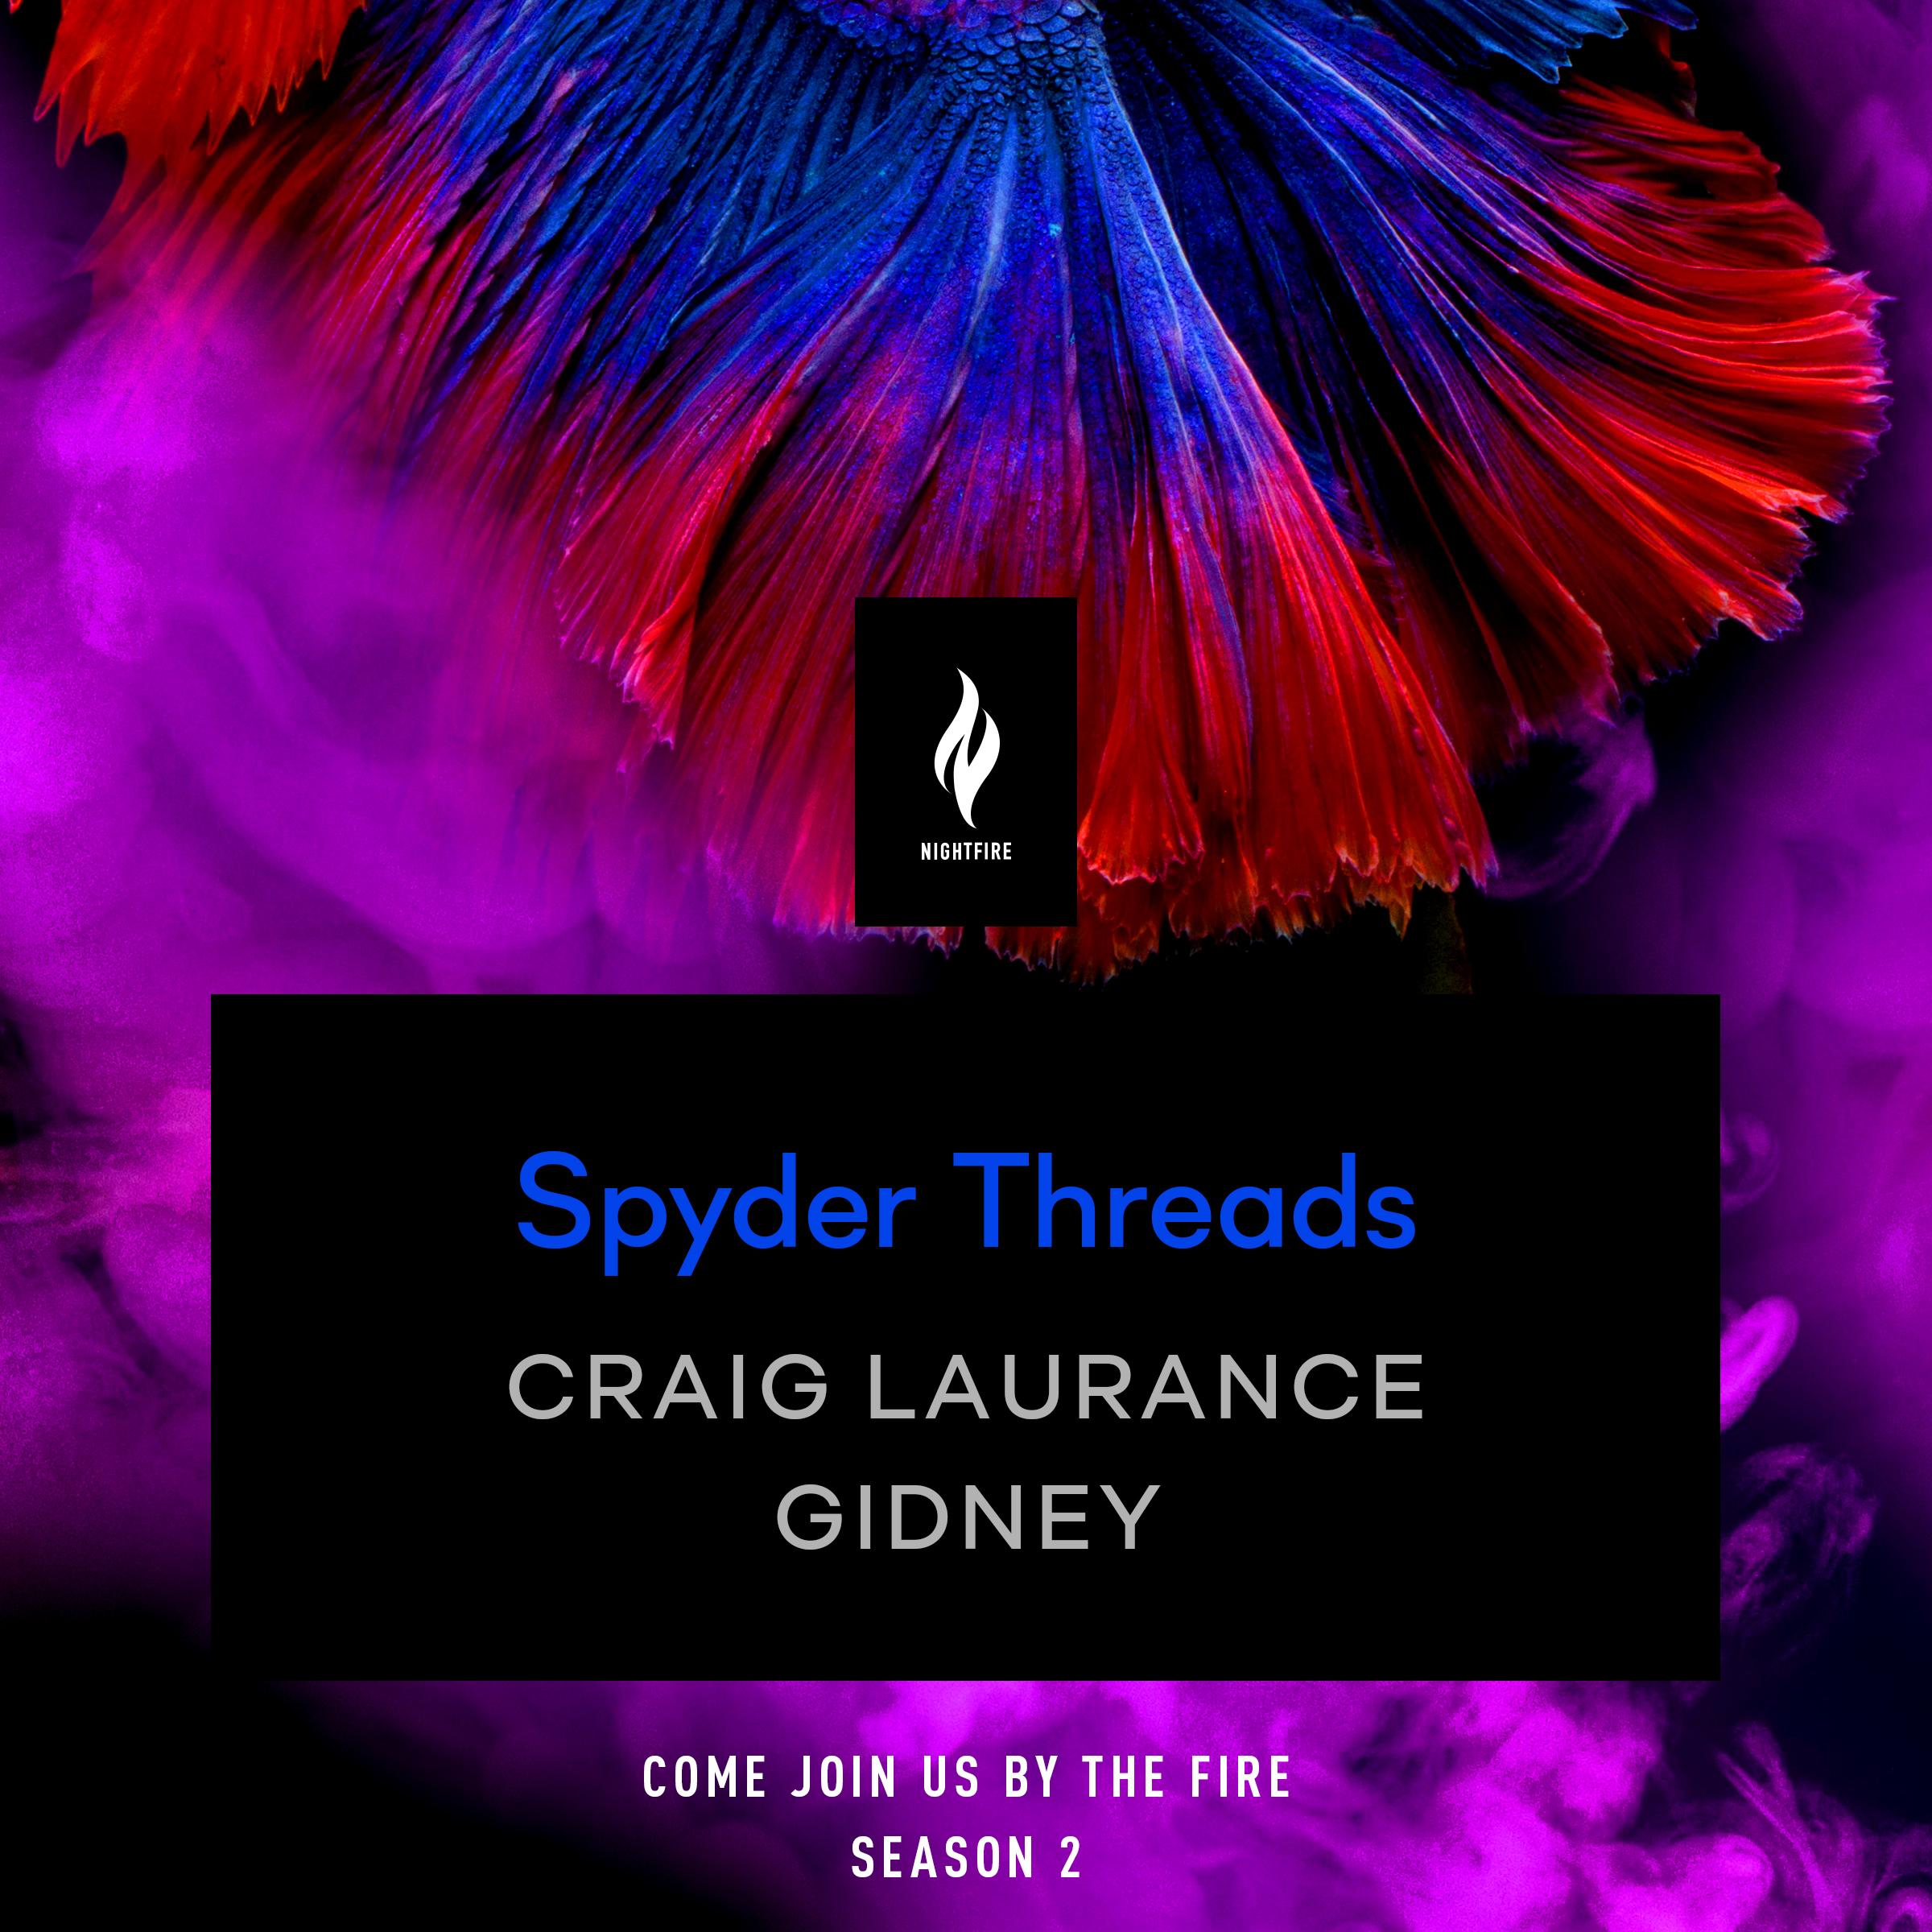 SpyderThreads_Gidney